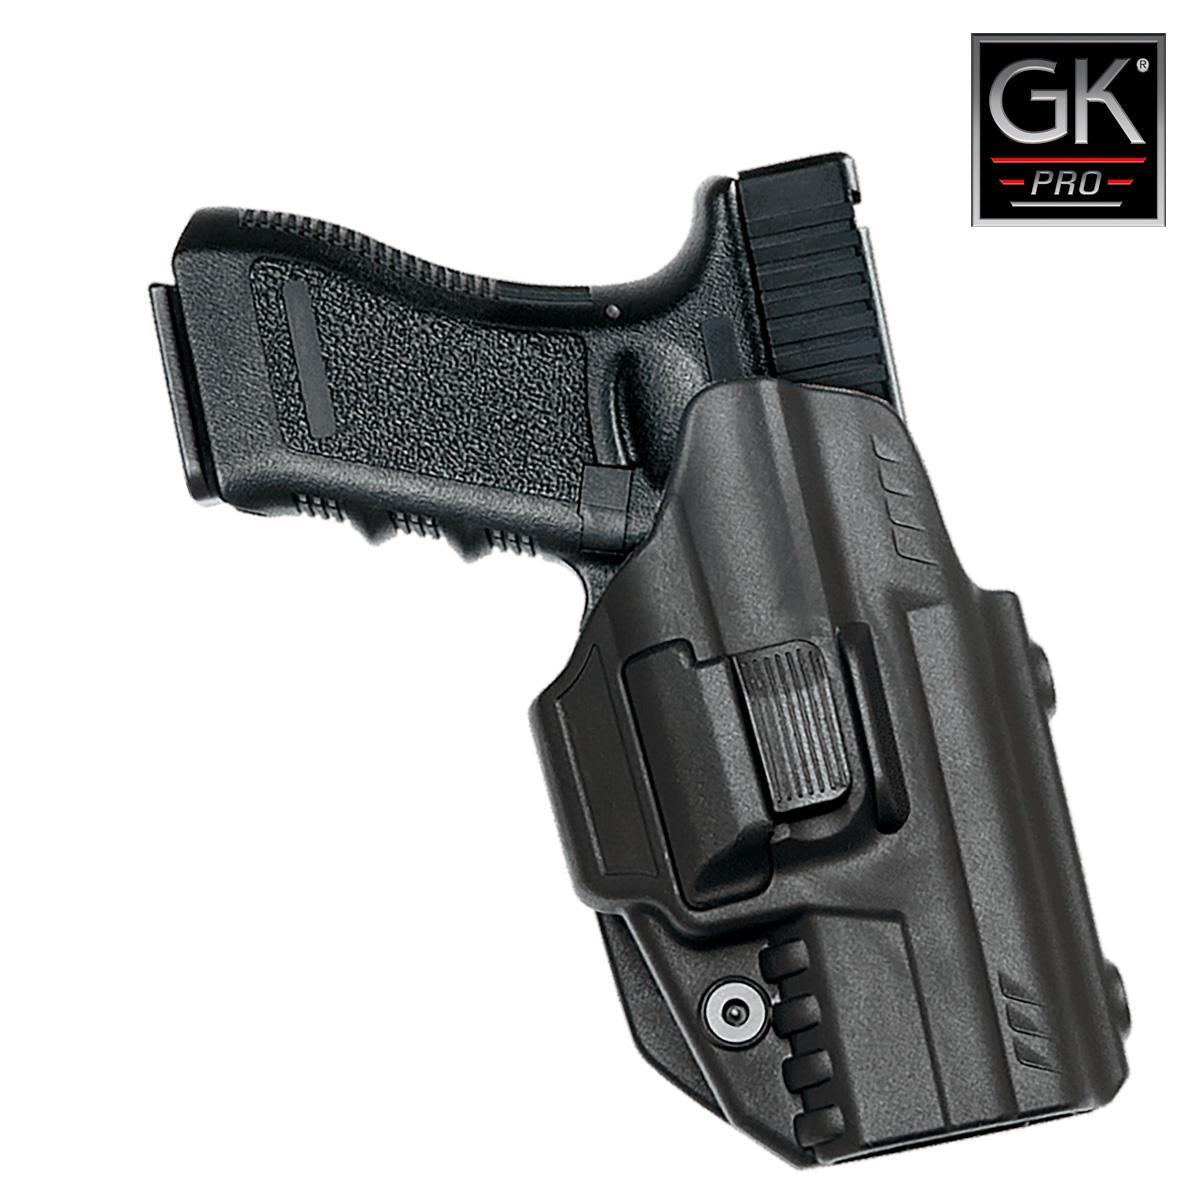 Funda GK para Pistola HK USP